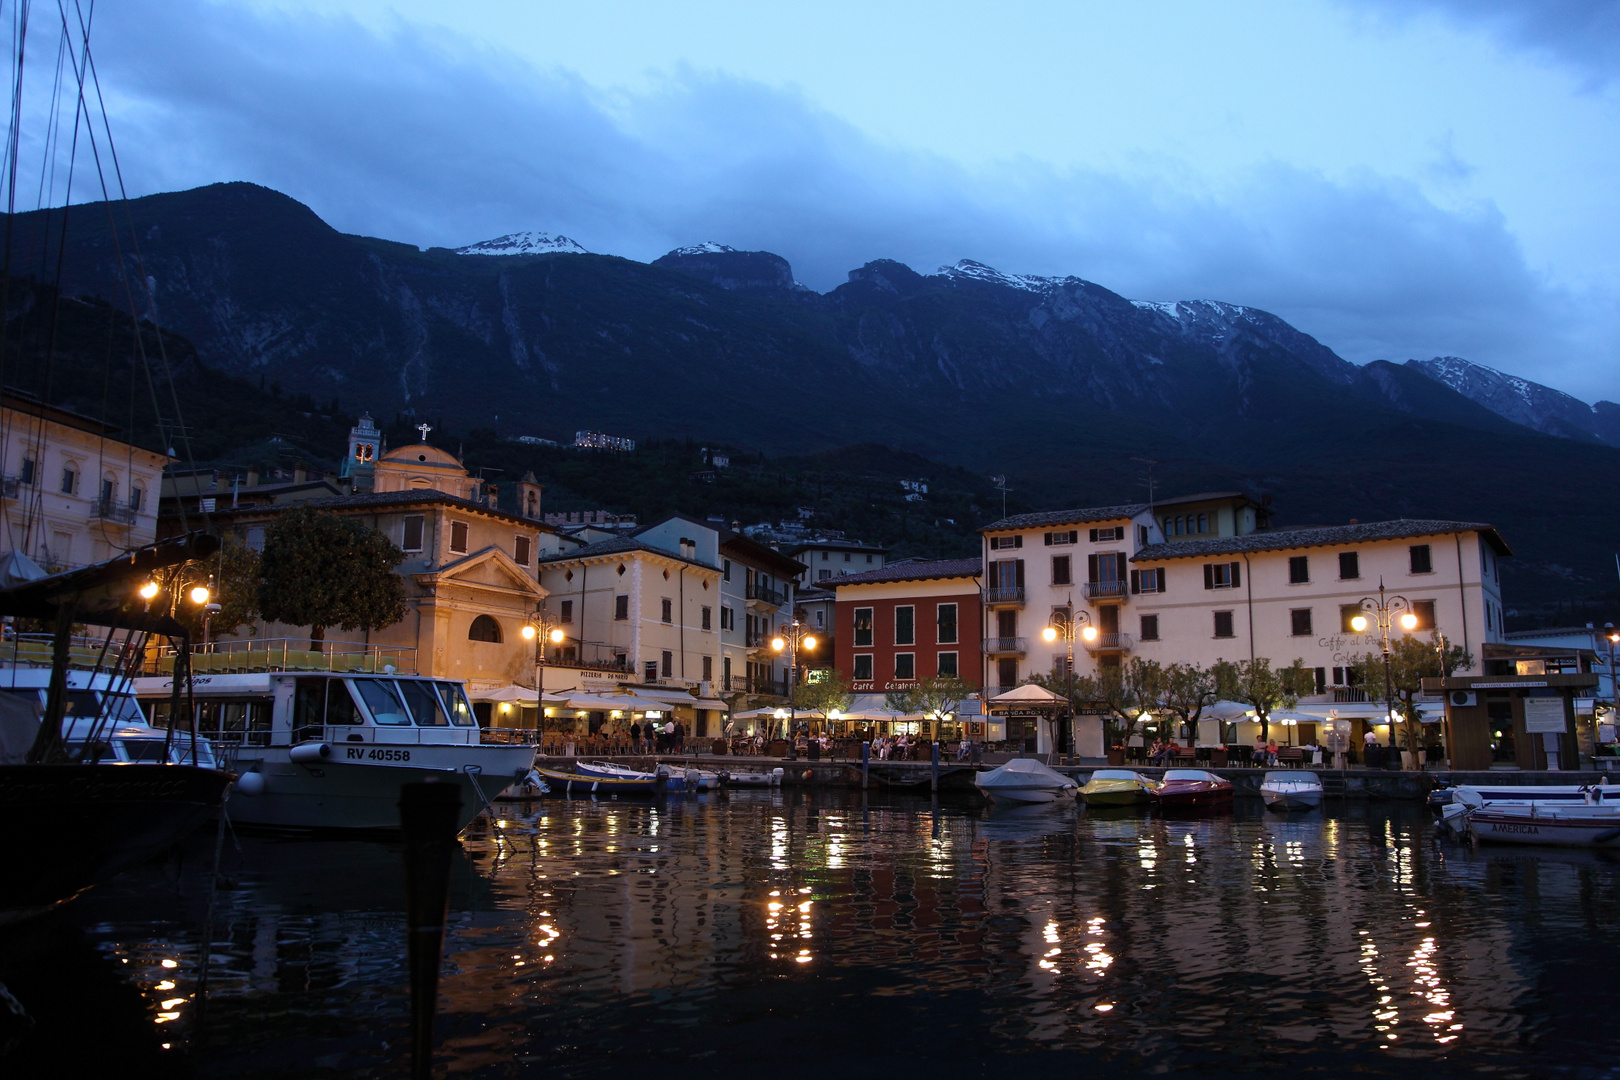 Hafen Malcesine